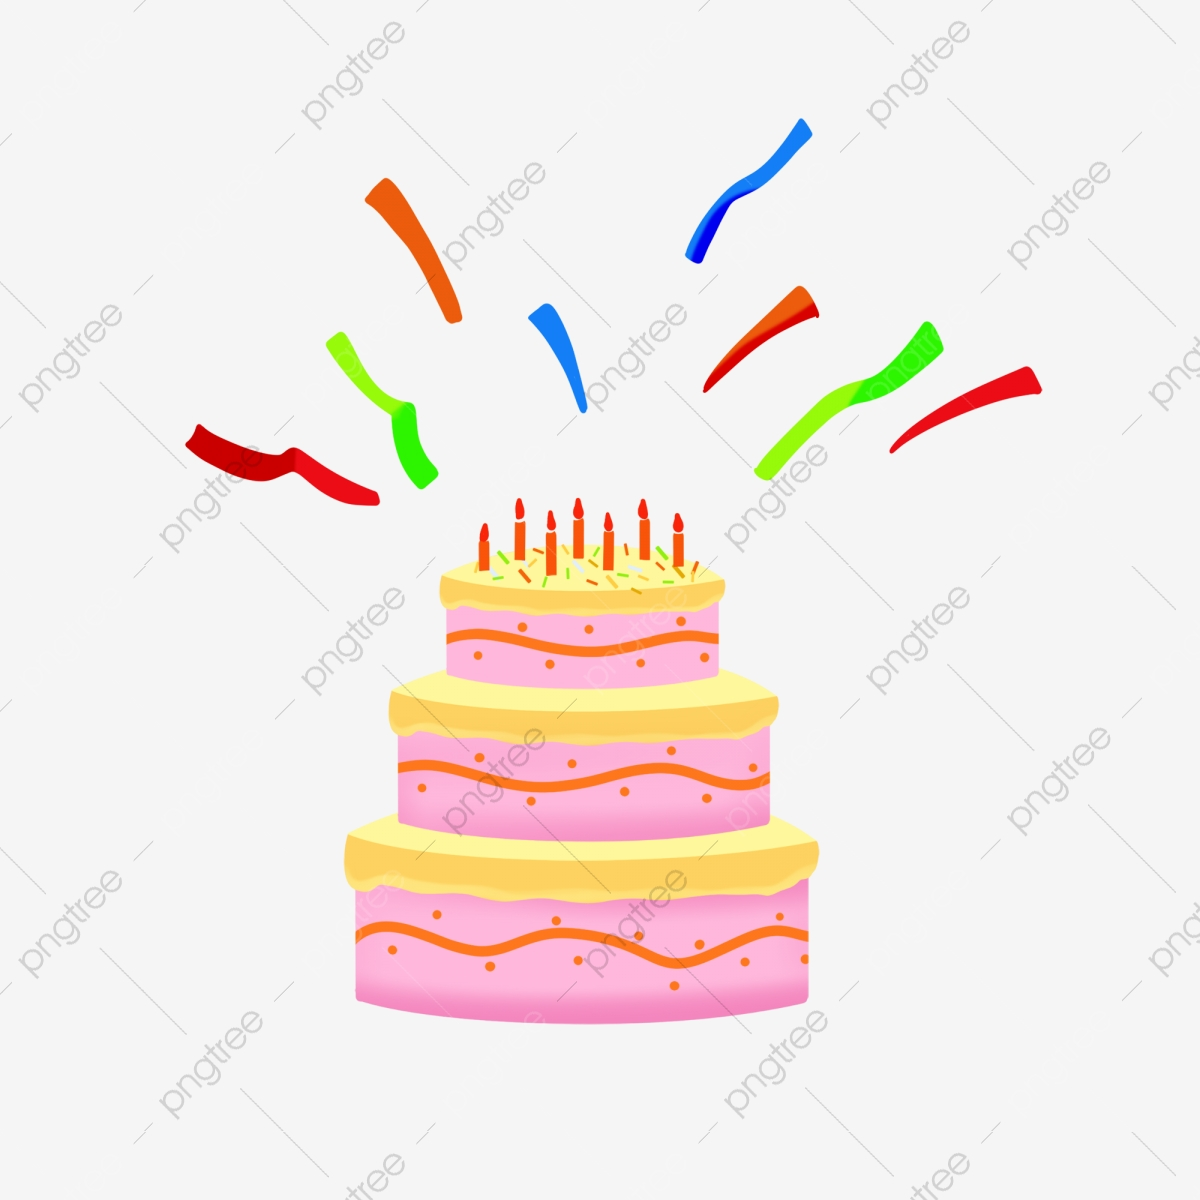 Peachy Fireworks Balloon Birthday Cake Ribbon Combination Party Funny Birthday Cards Online Bapapcheapnameinfo